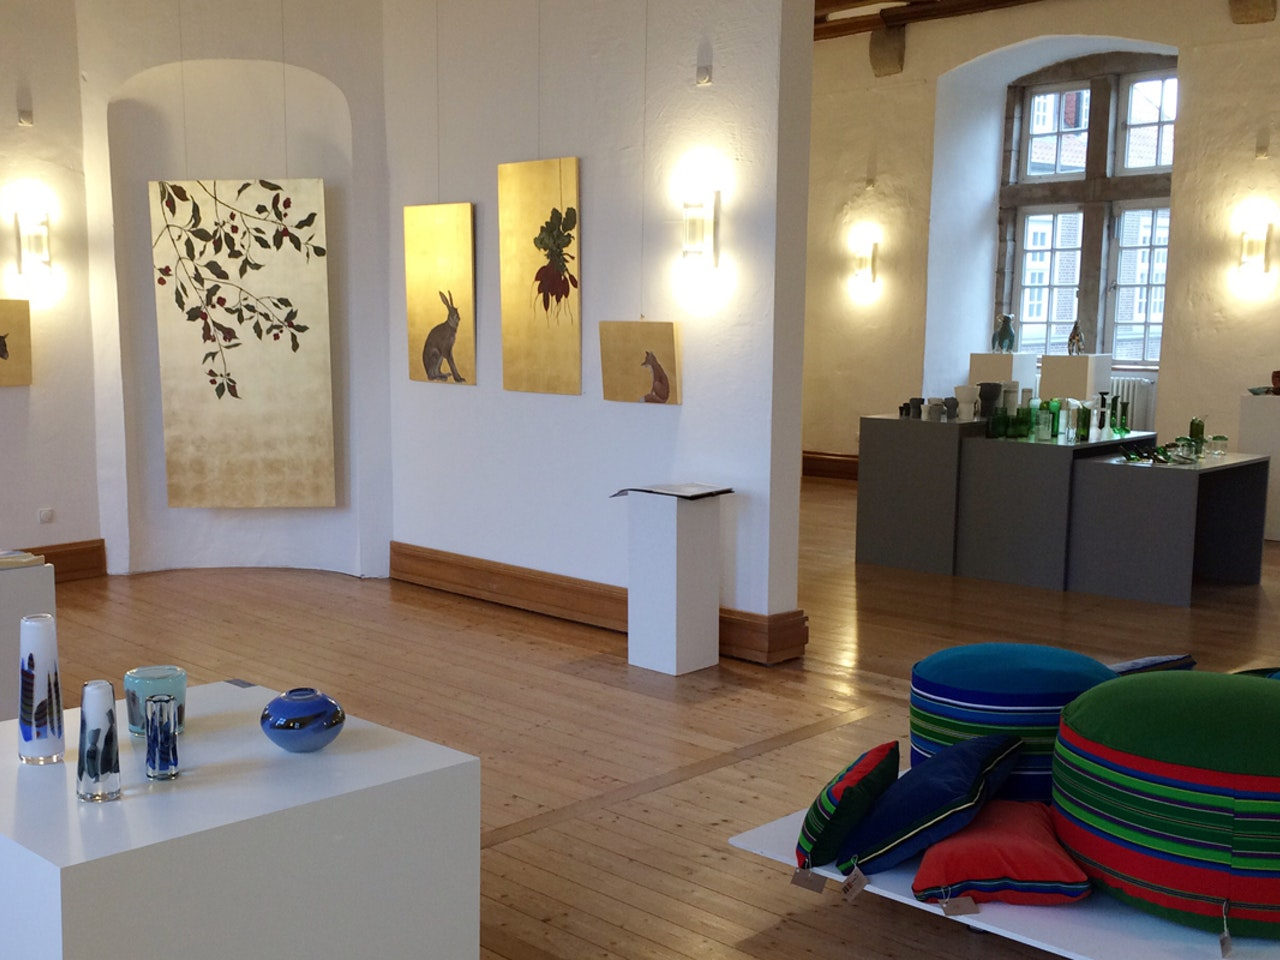 Eröffnung Schlosshandel 2017 - Schloss Landestrost Neustadt am Rbg.